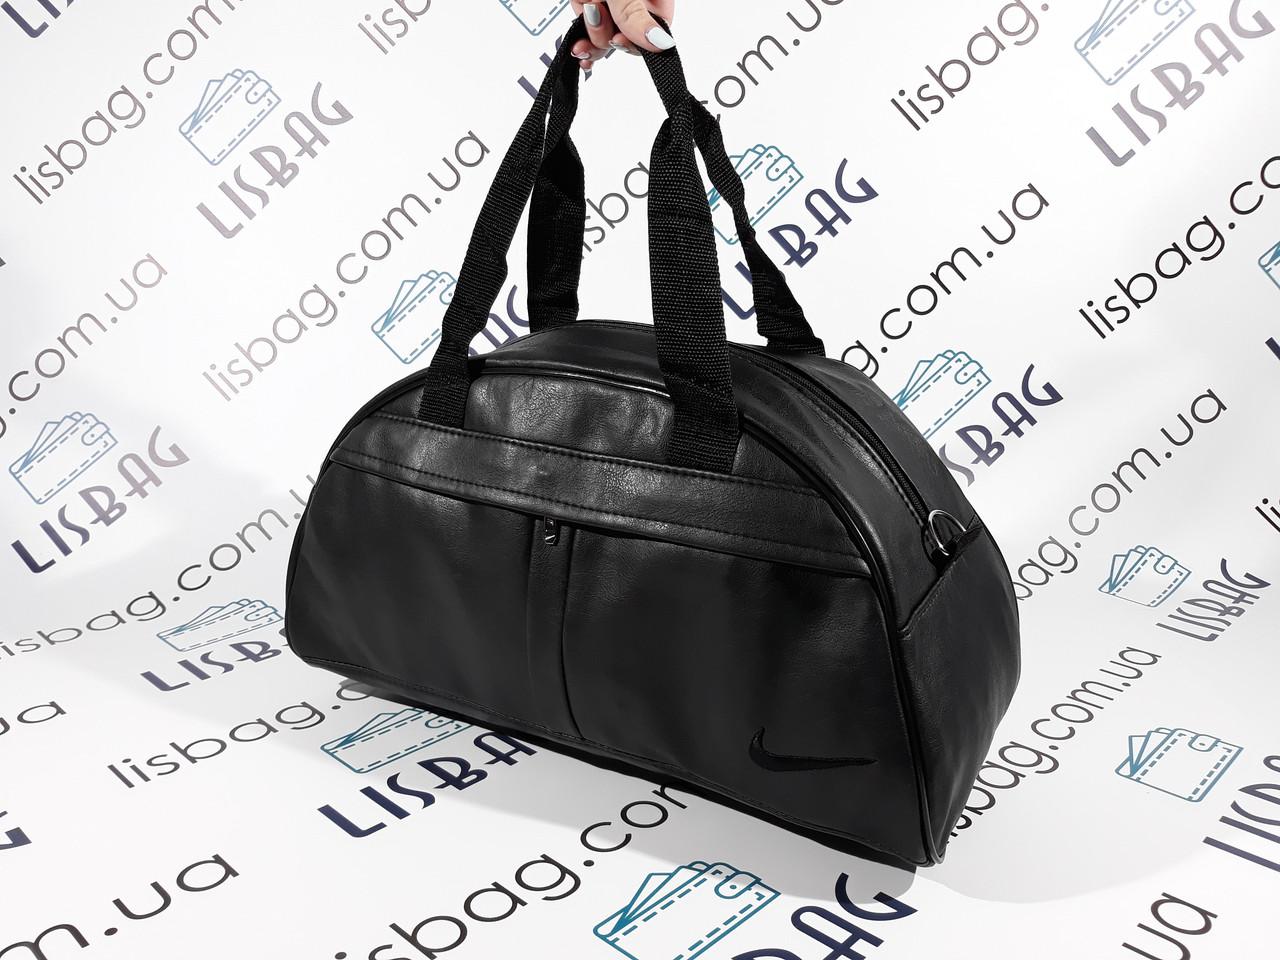 1410d51e ... Спортивная сумка найк копия черная на тренировку через плече, ...